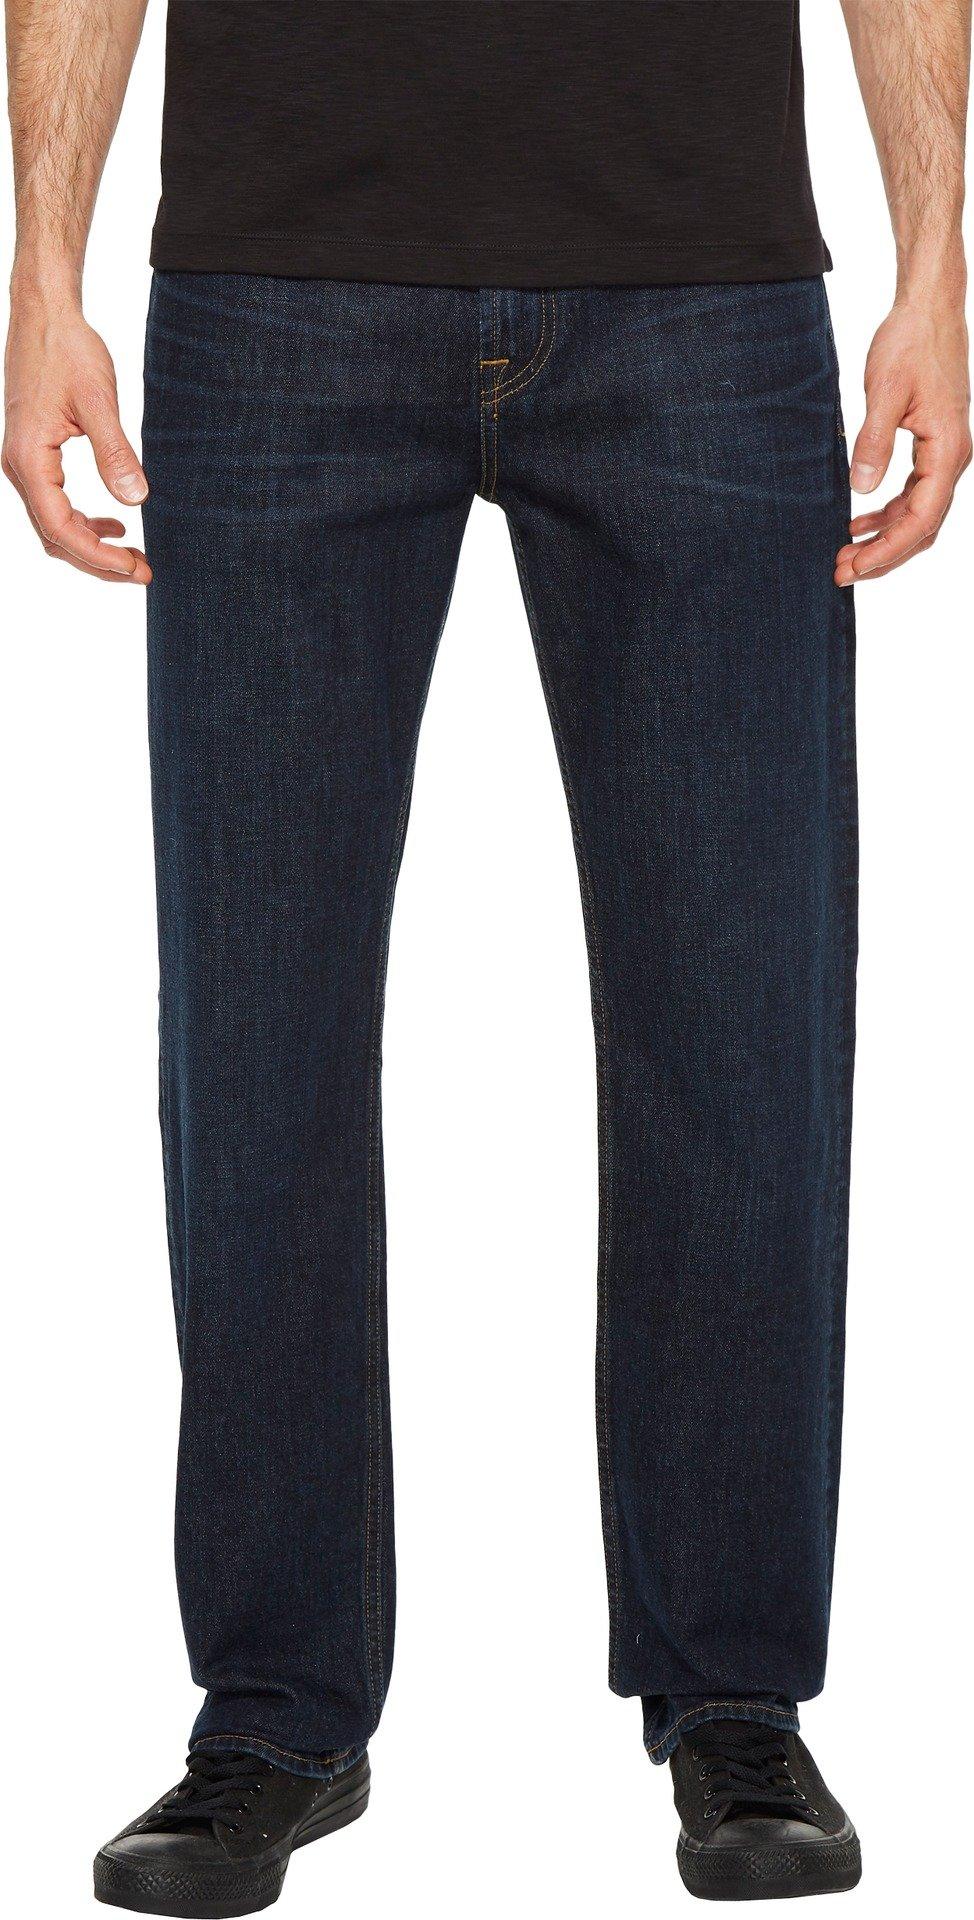 7 For All Mankind Men's Standard Straight Leg Jean, Forfeit, 40